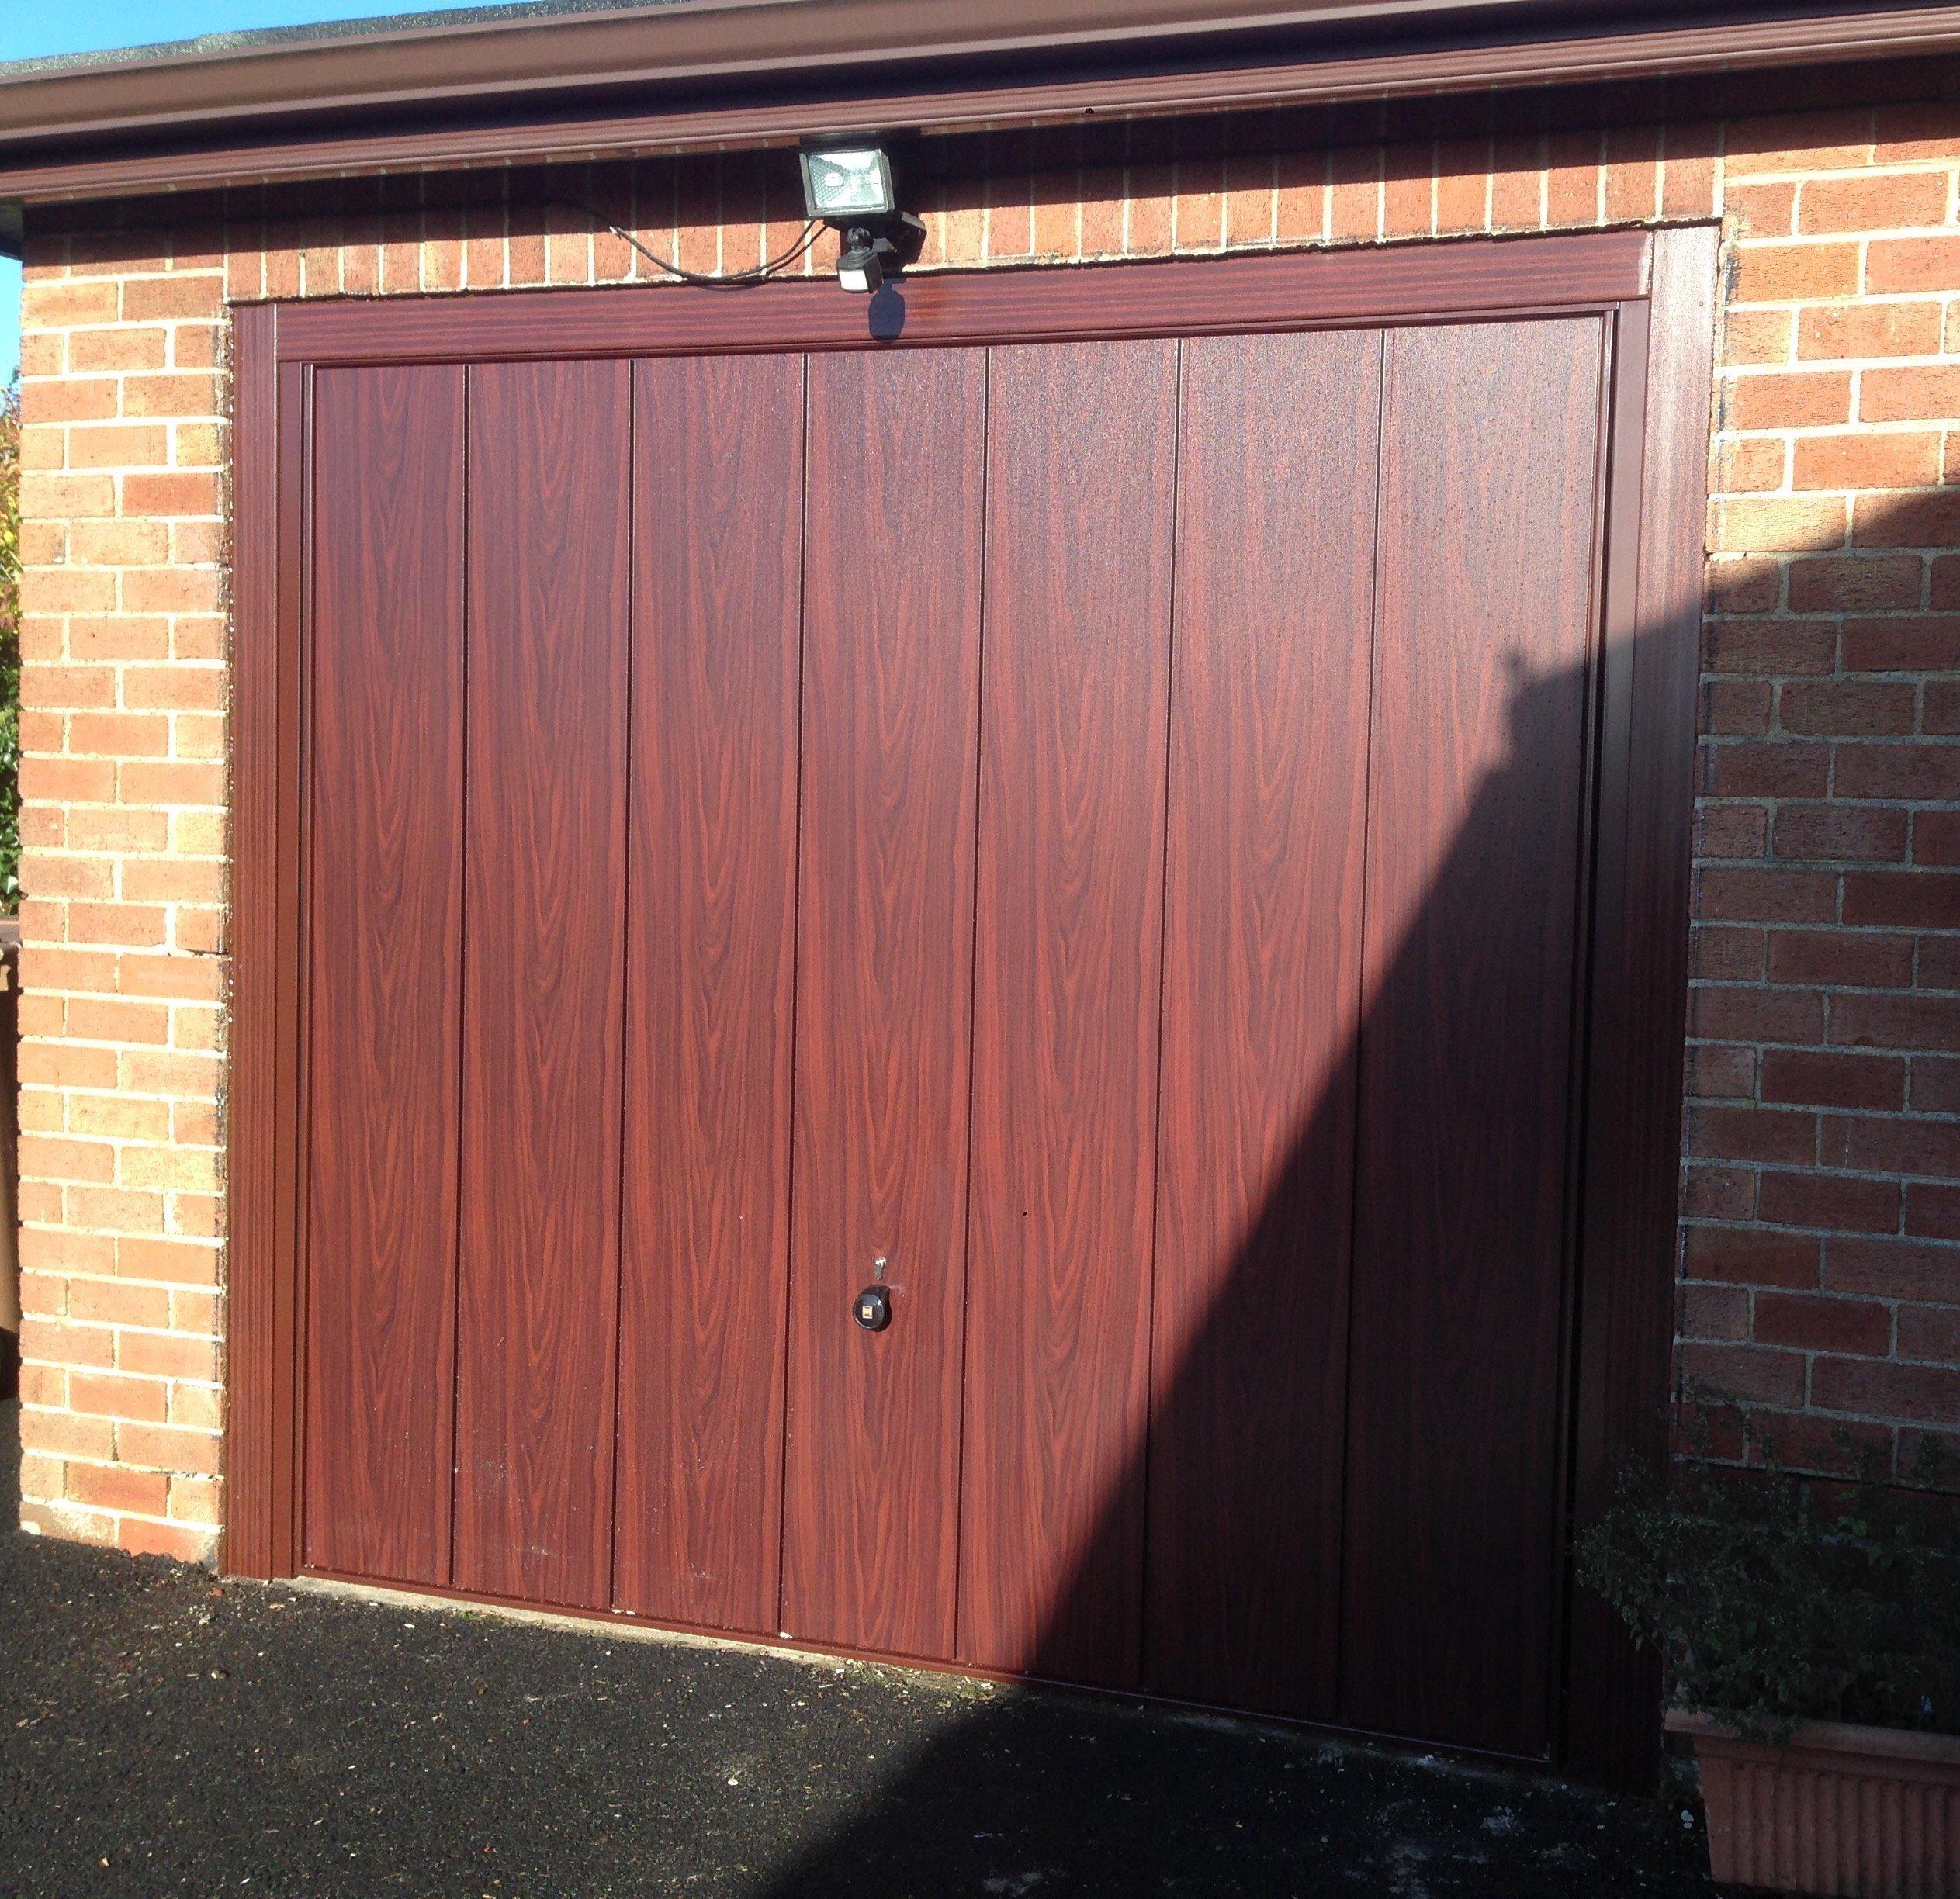 door opener jackshaft rating elite liftmaster review editor residential garage